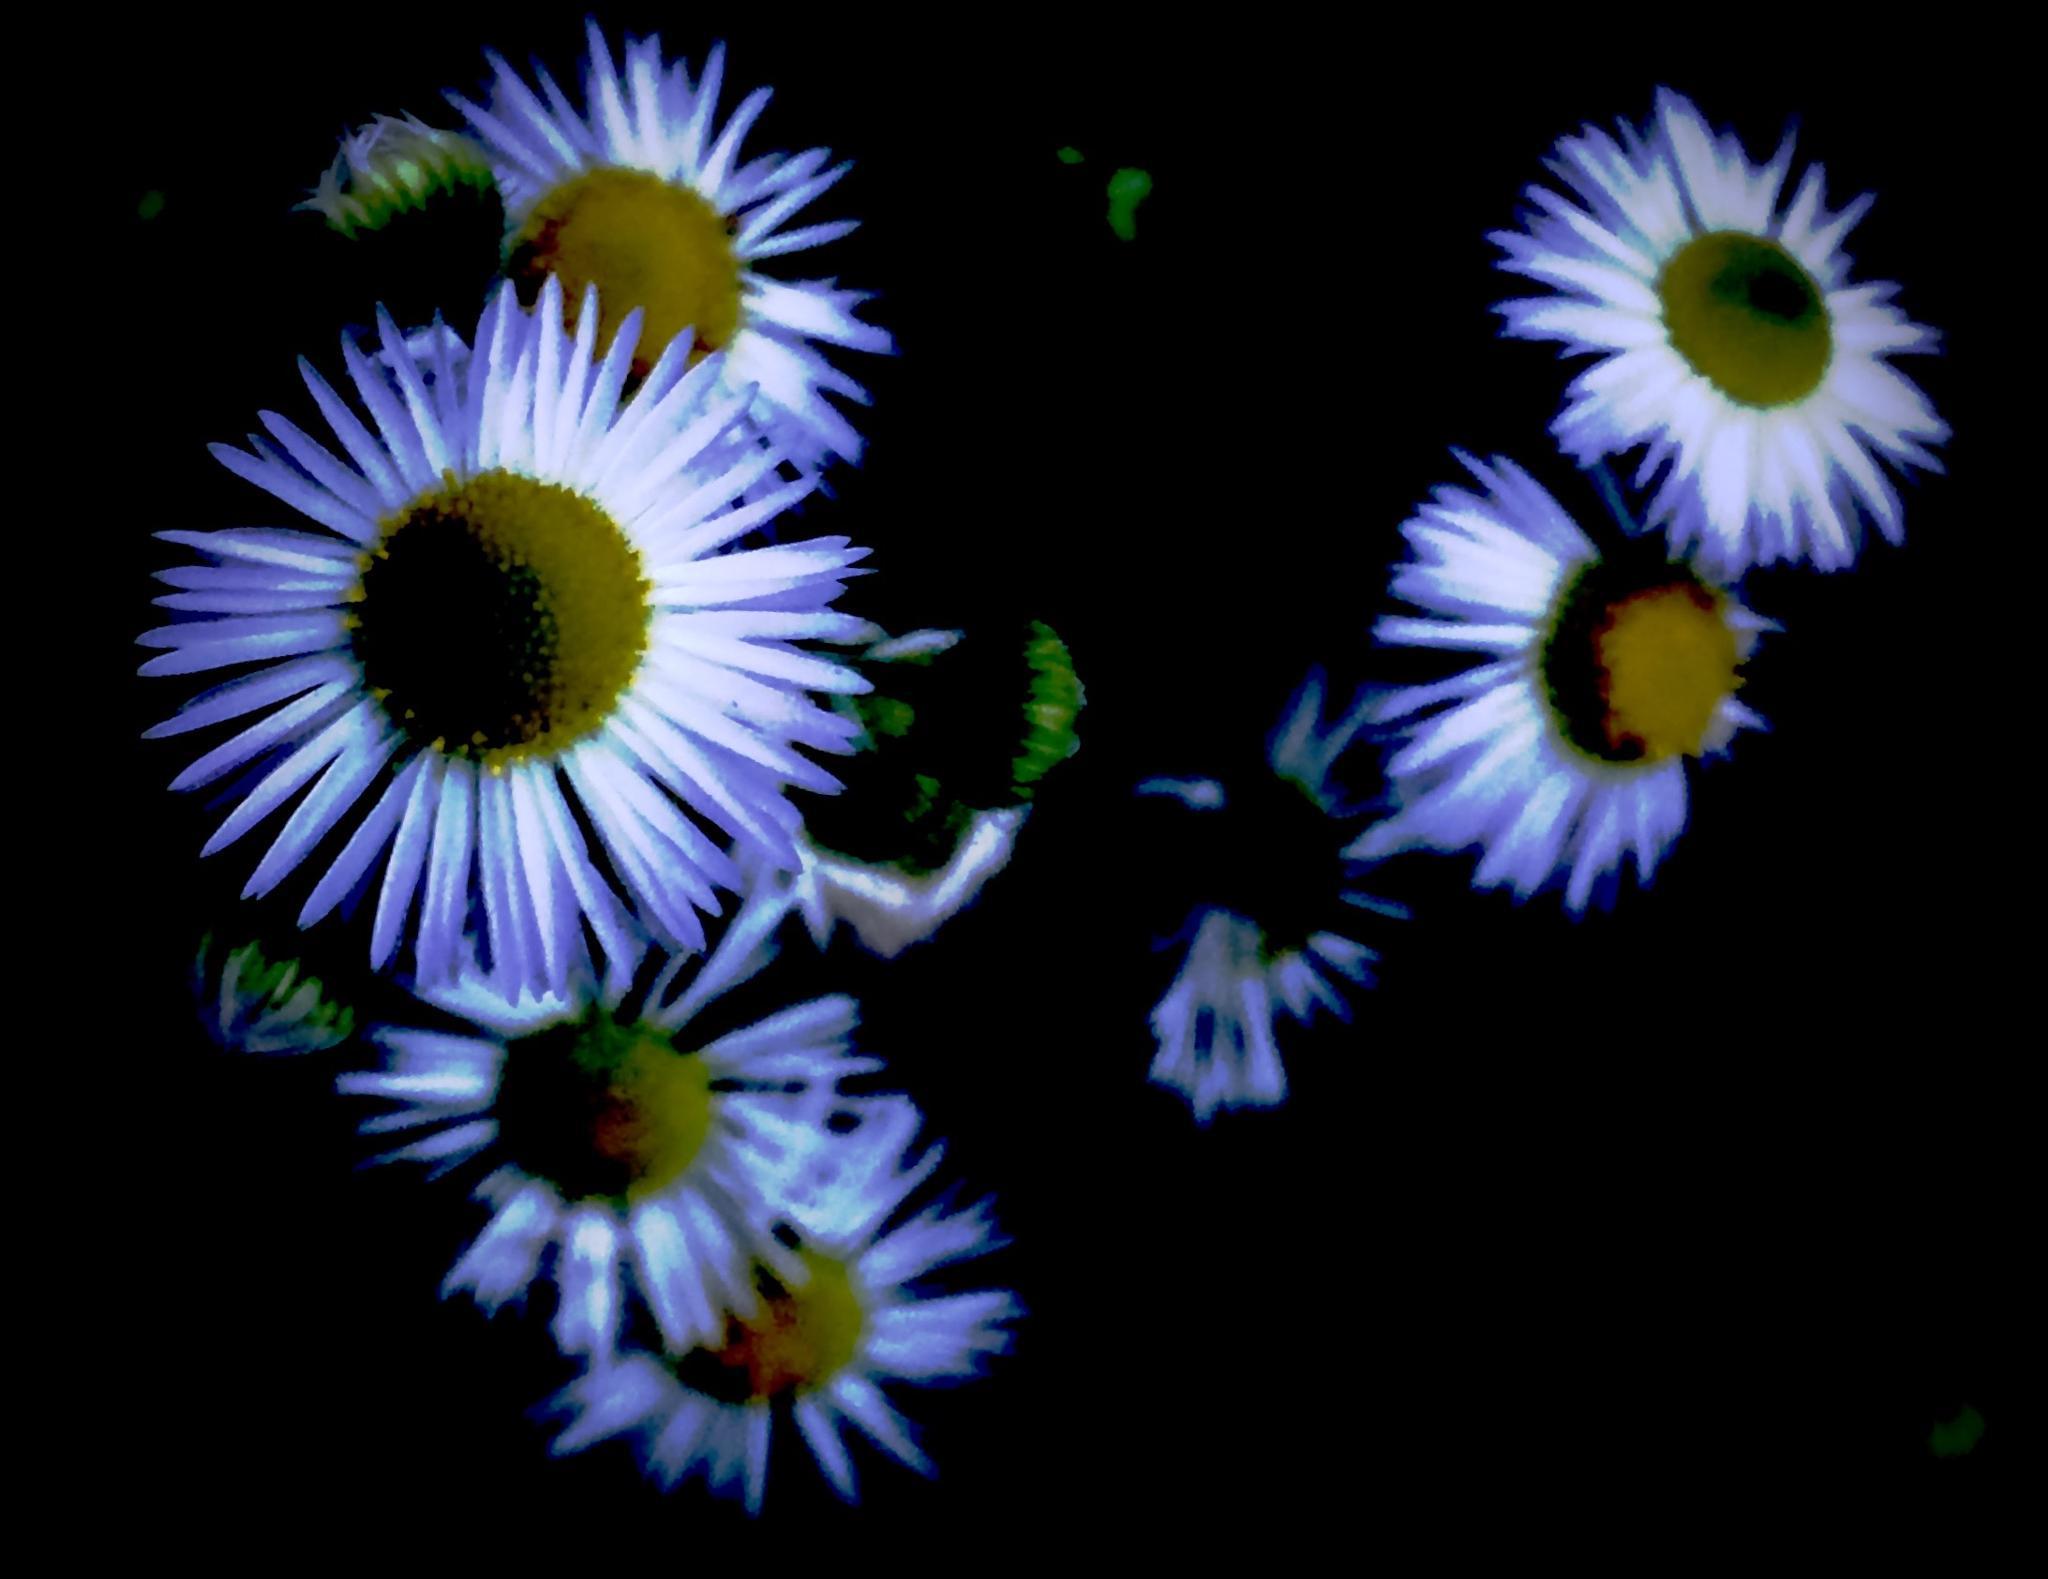 Weeds in Bloom by 103aspen10